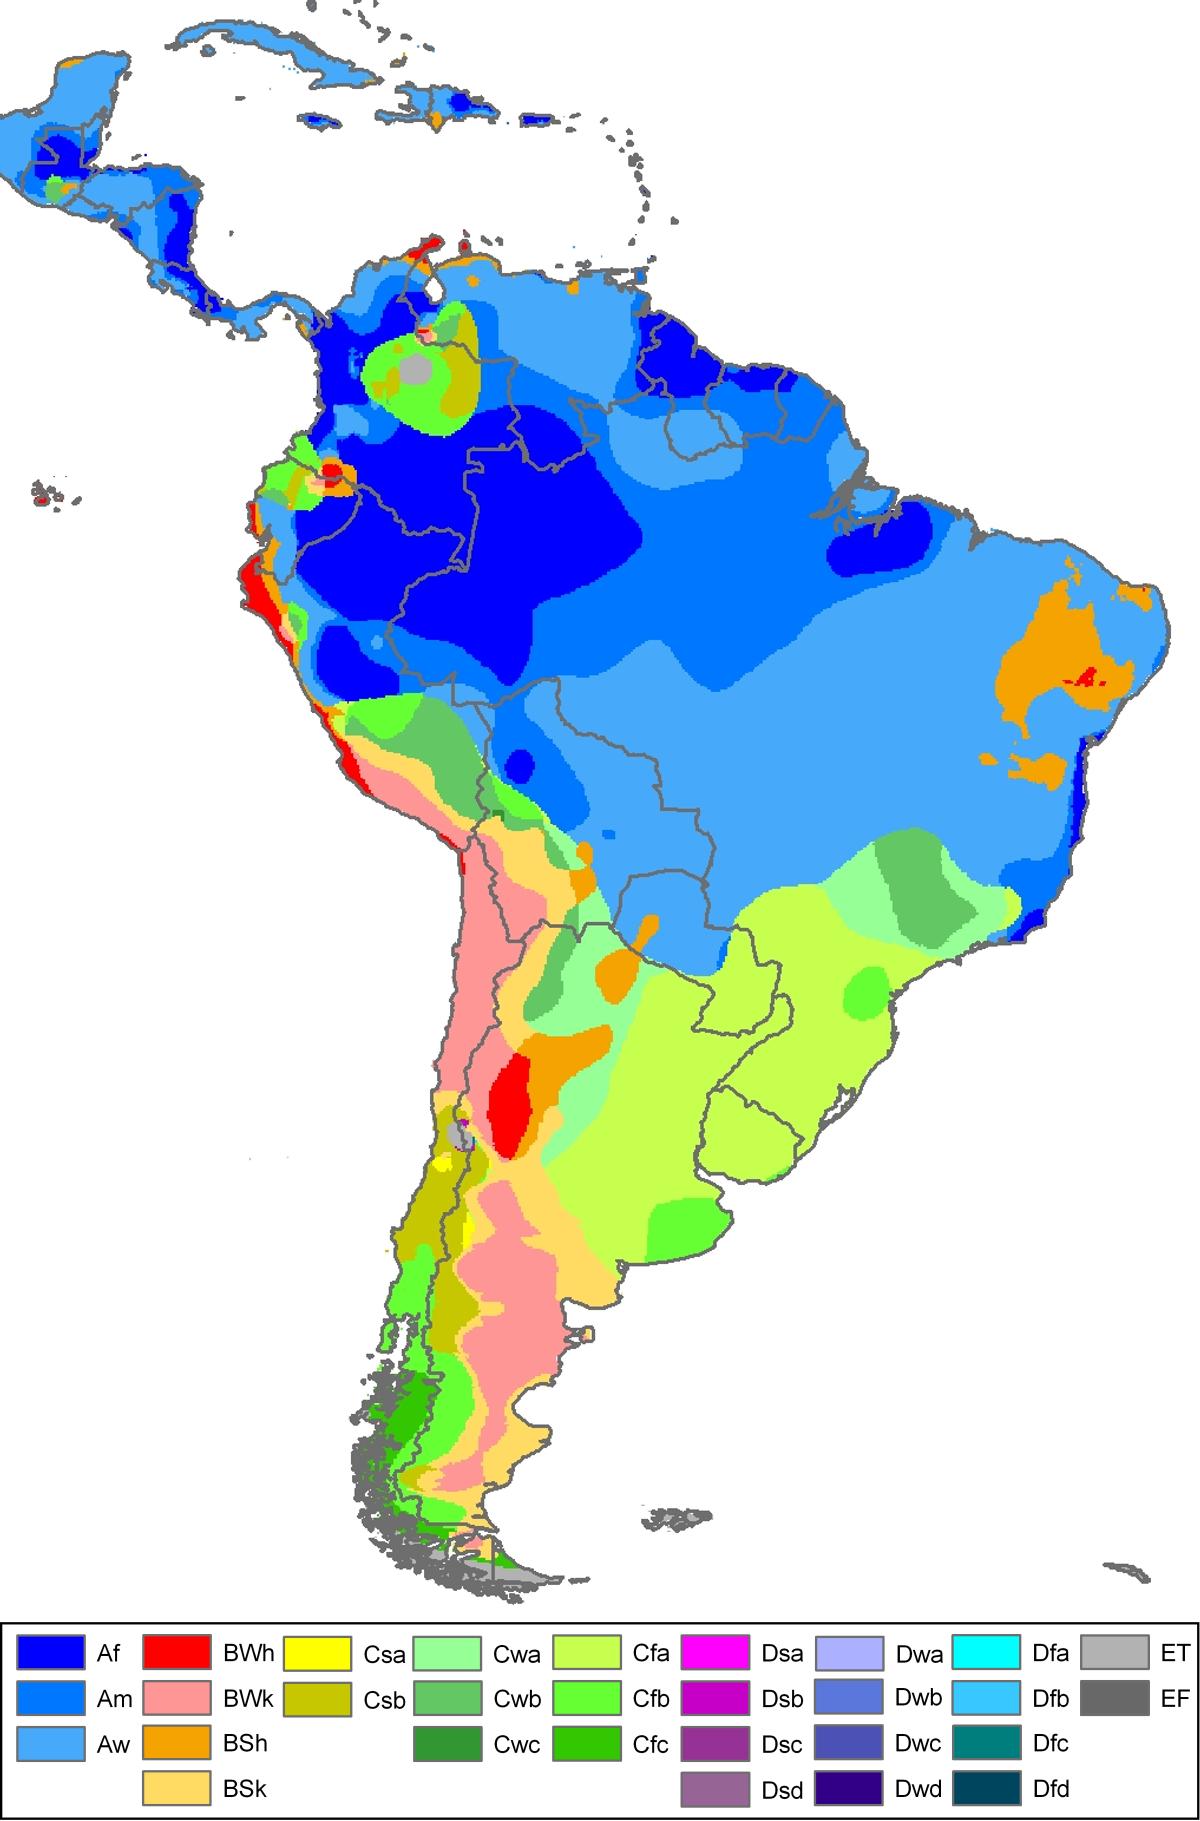 Mapa climático de América del Sur 2007